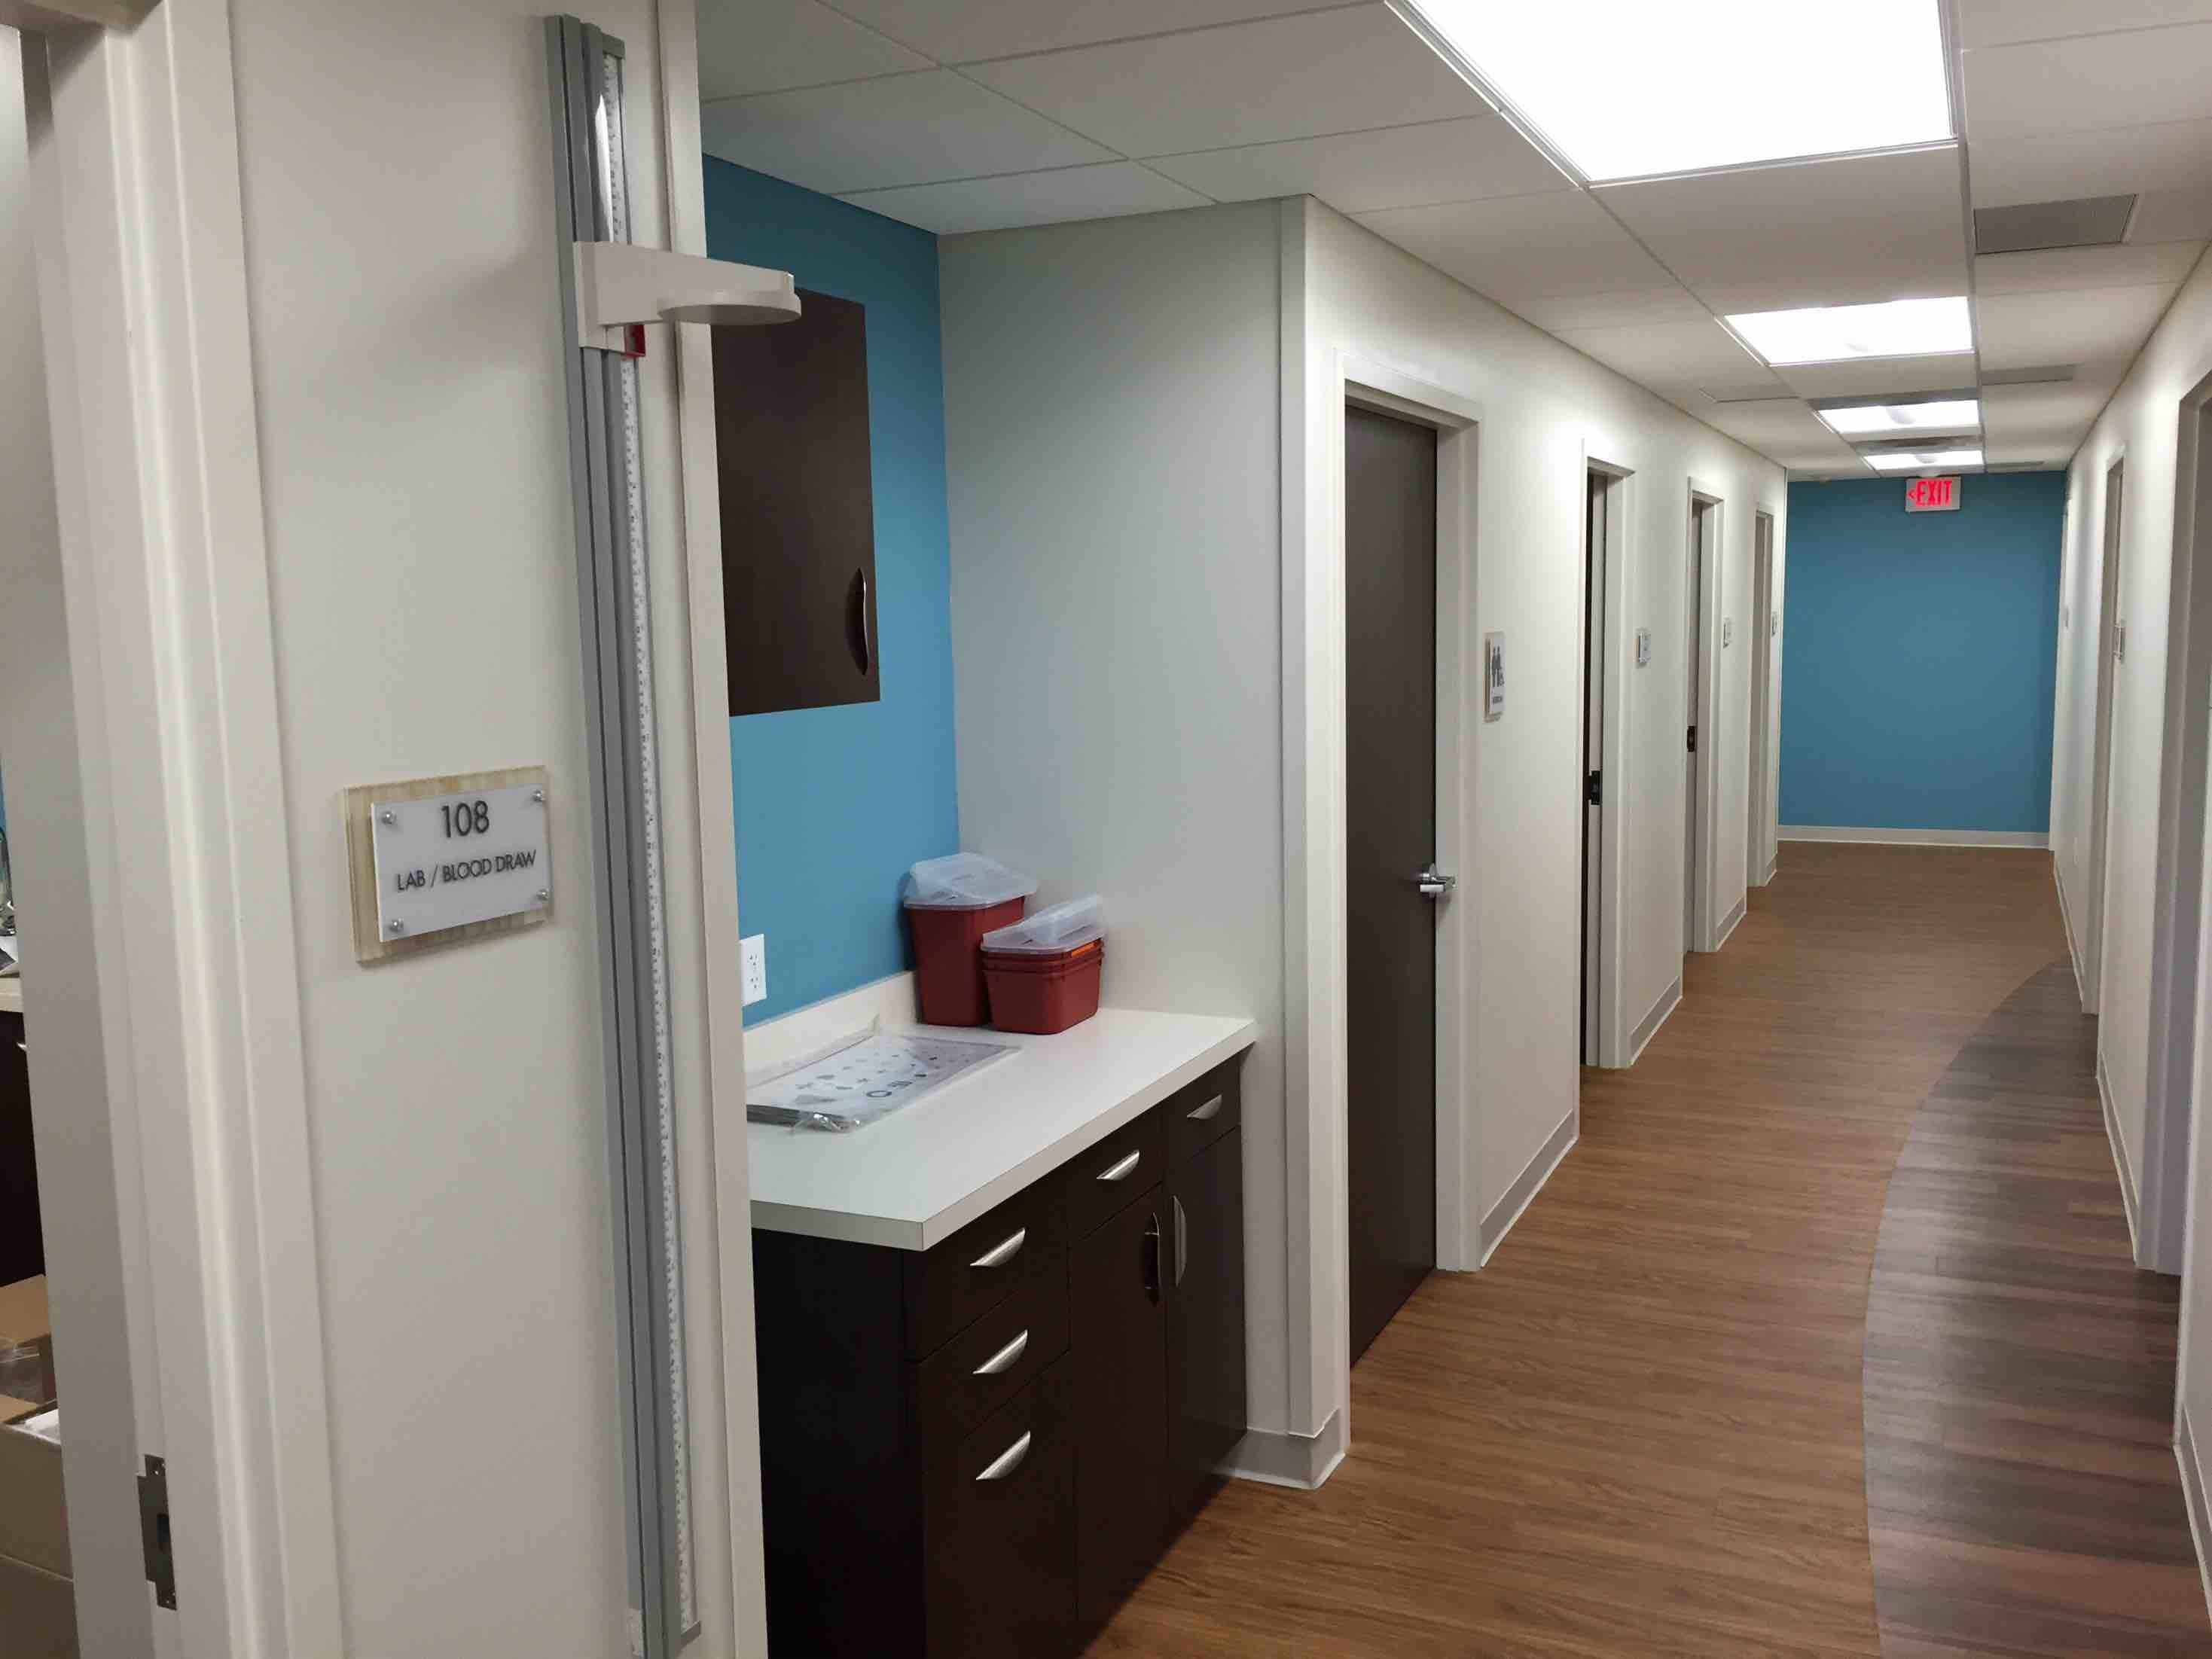 Marathon Health office construction by Retail Construction Services, Inc.